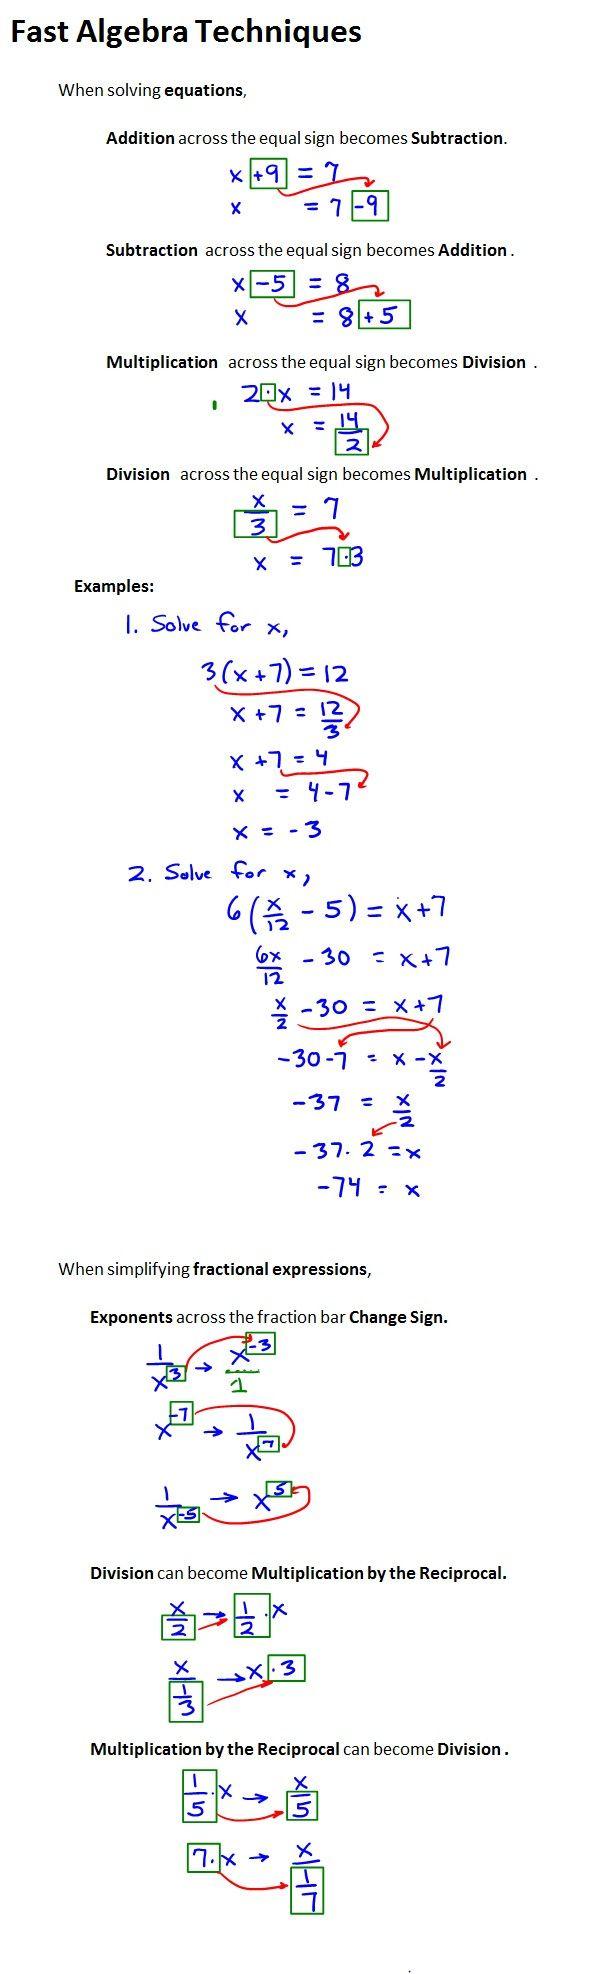 Fast Algebra Techniques